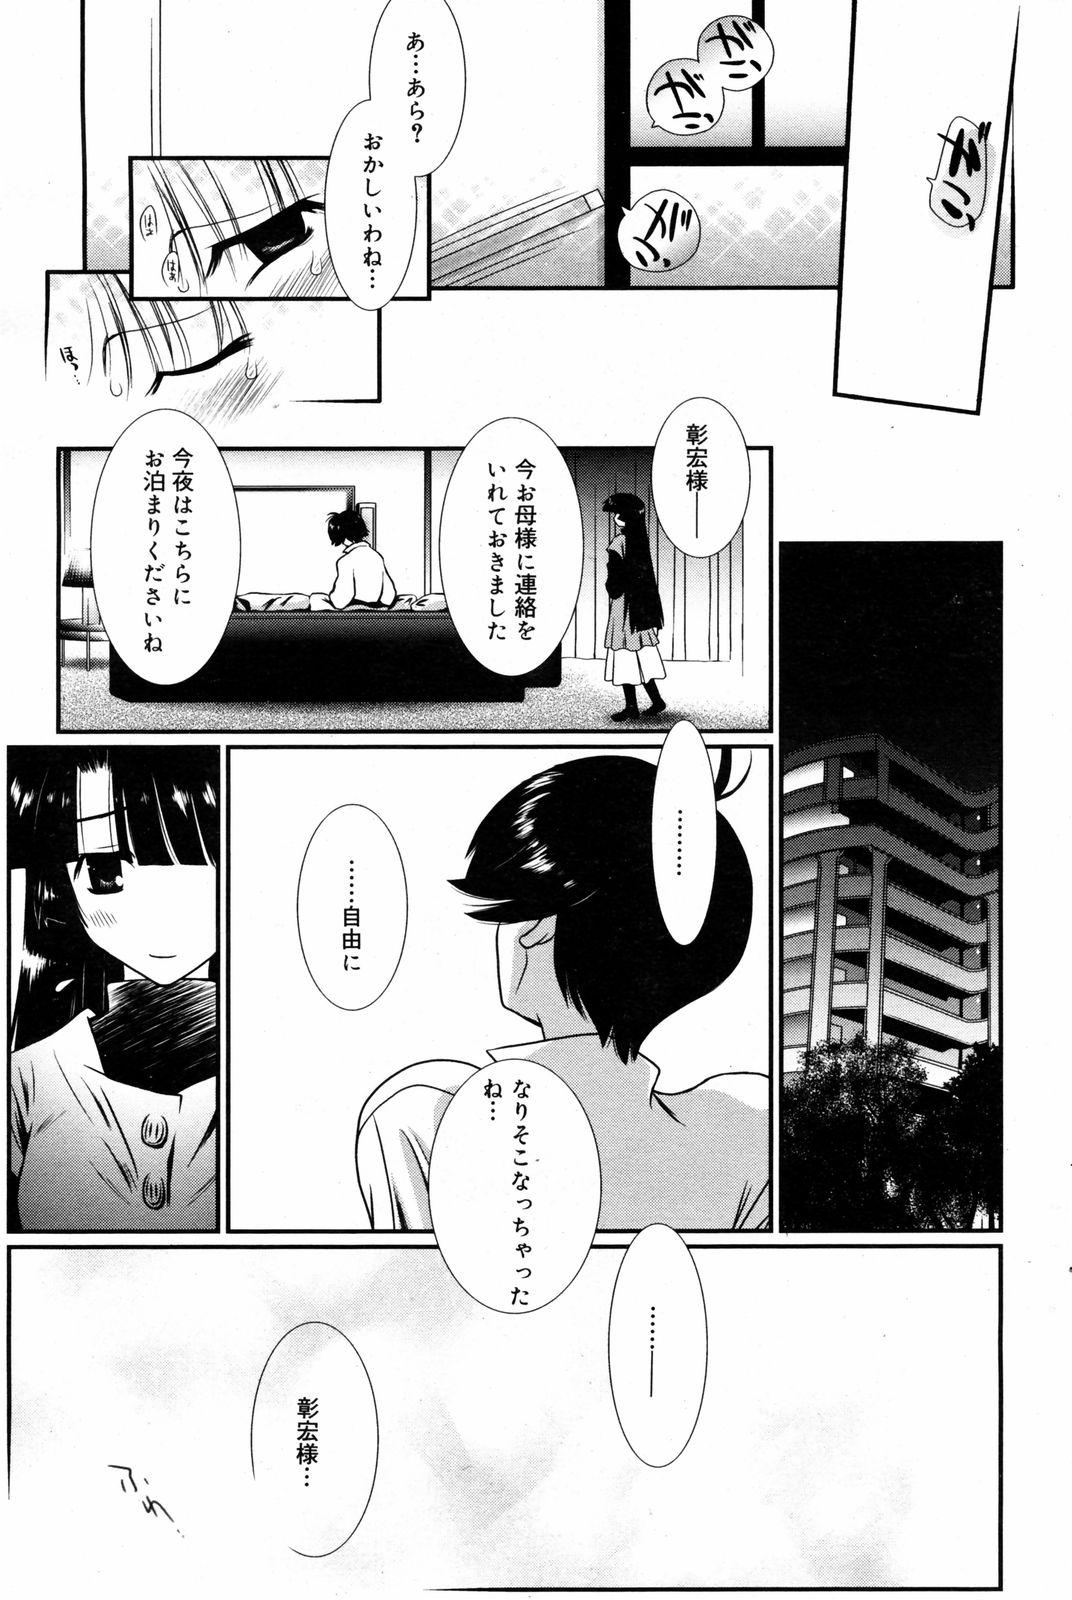 Manga Bangaichi 2008-03 78